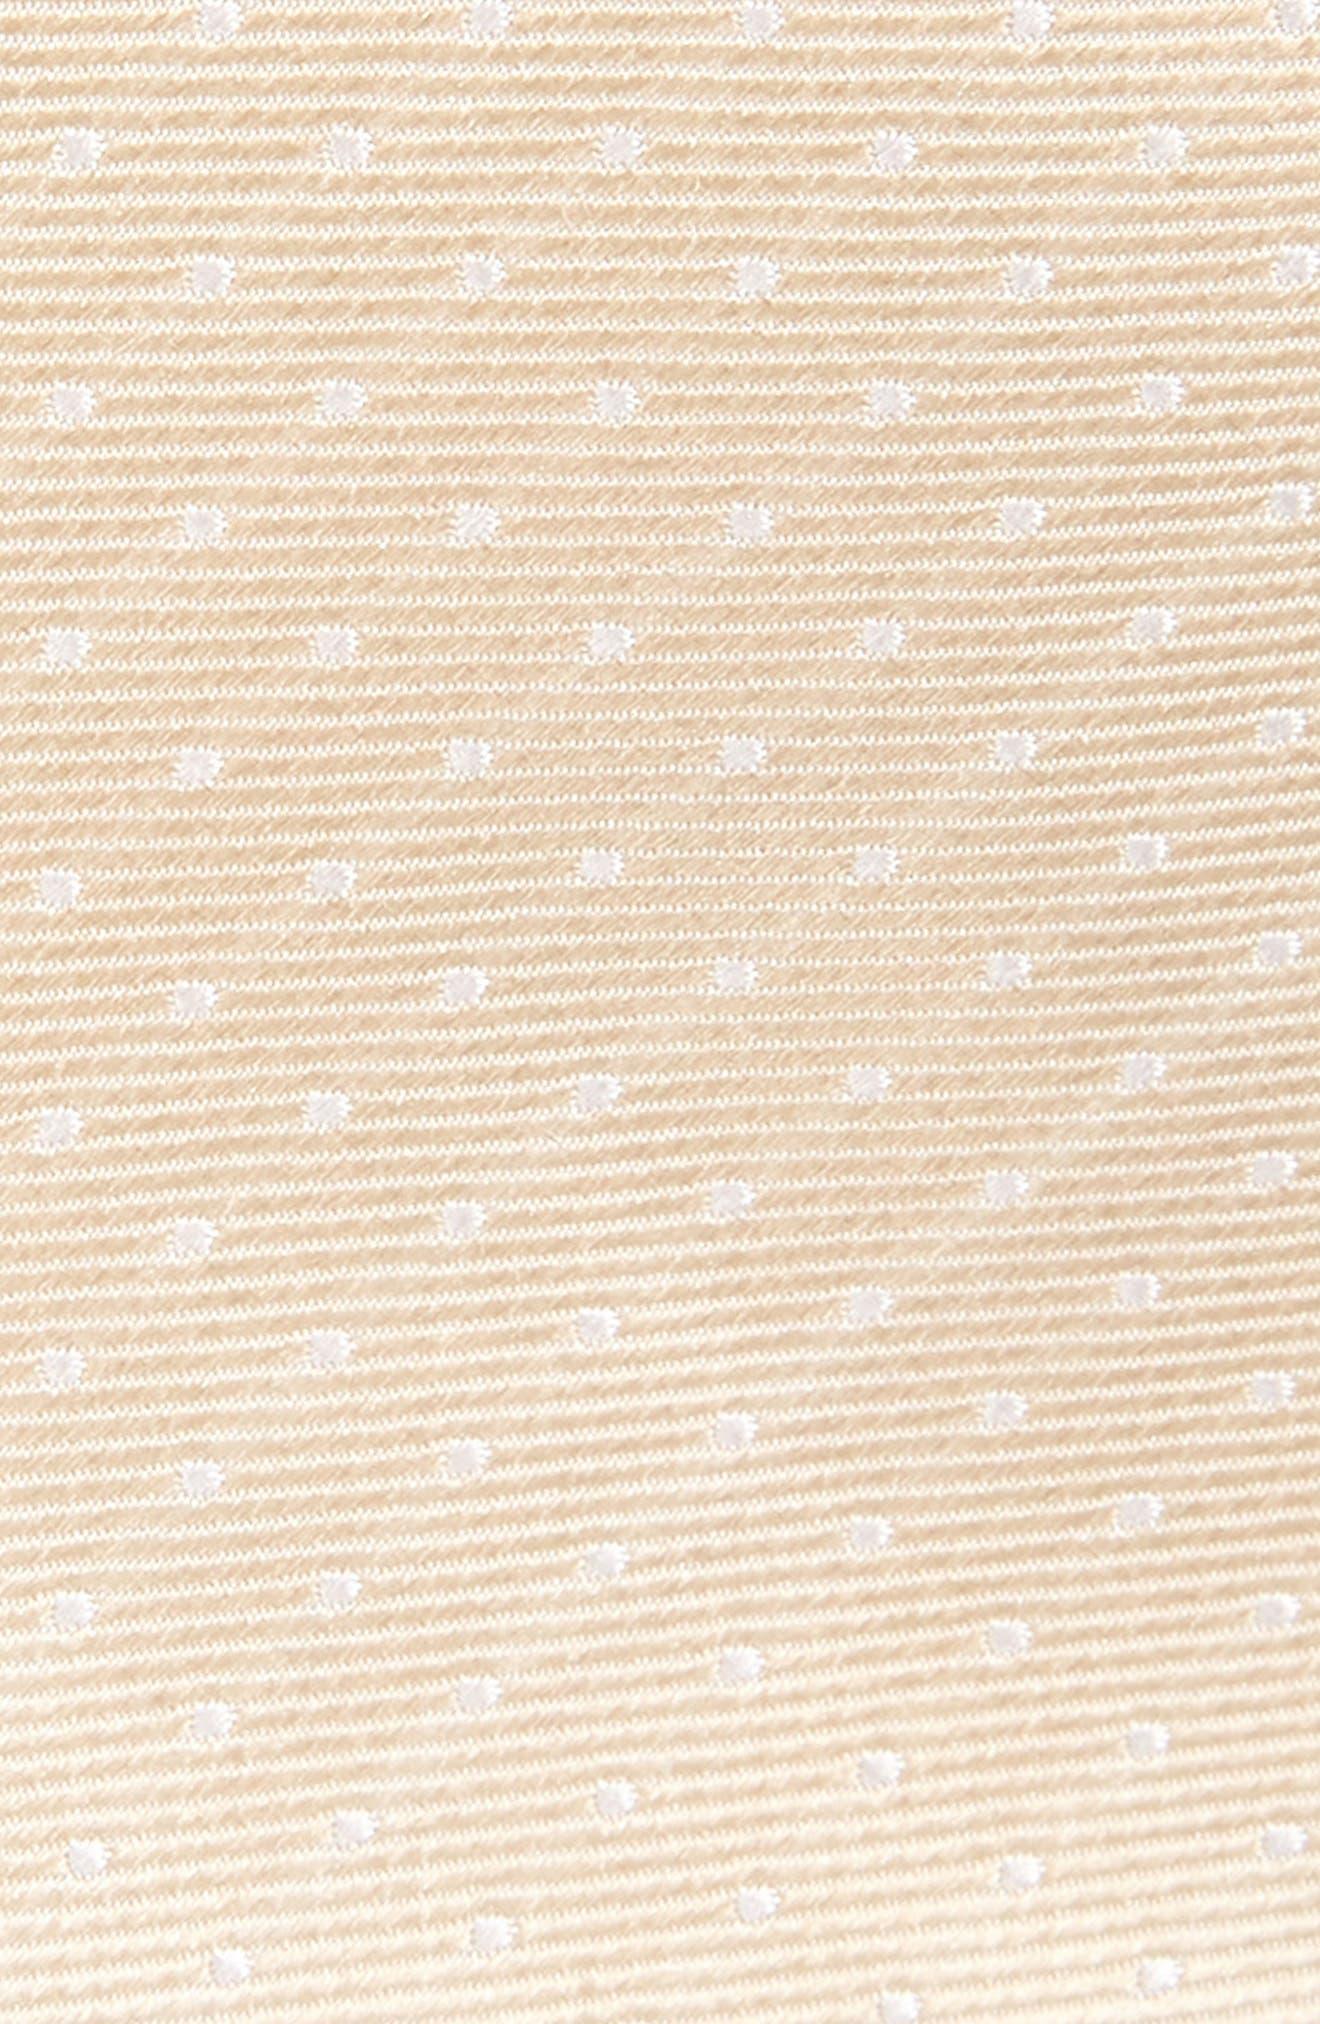 Dot Silk Tie,                             Alternate thumbnail 2, color,                             LIGHT CHAMPAGNE